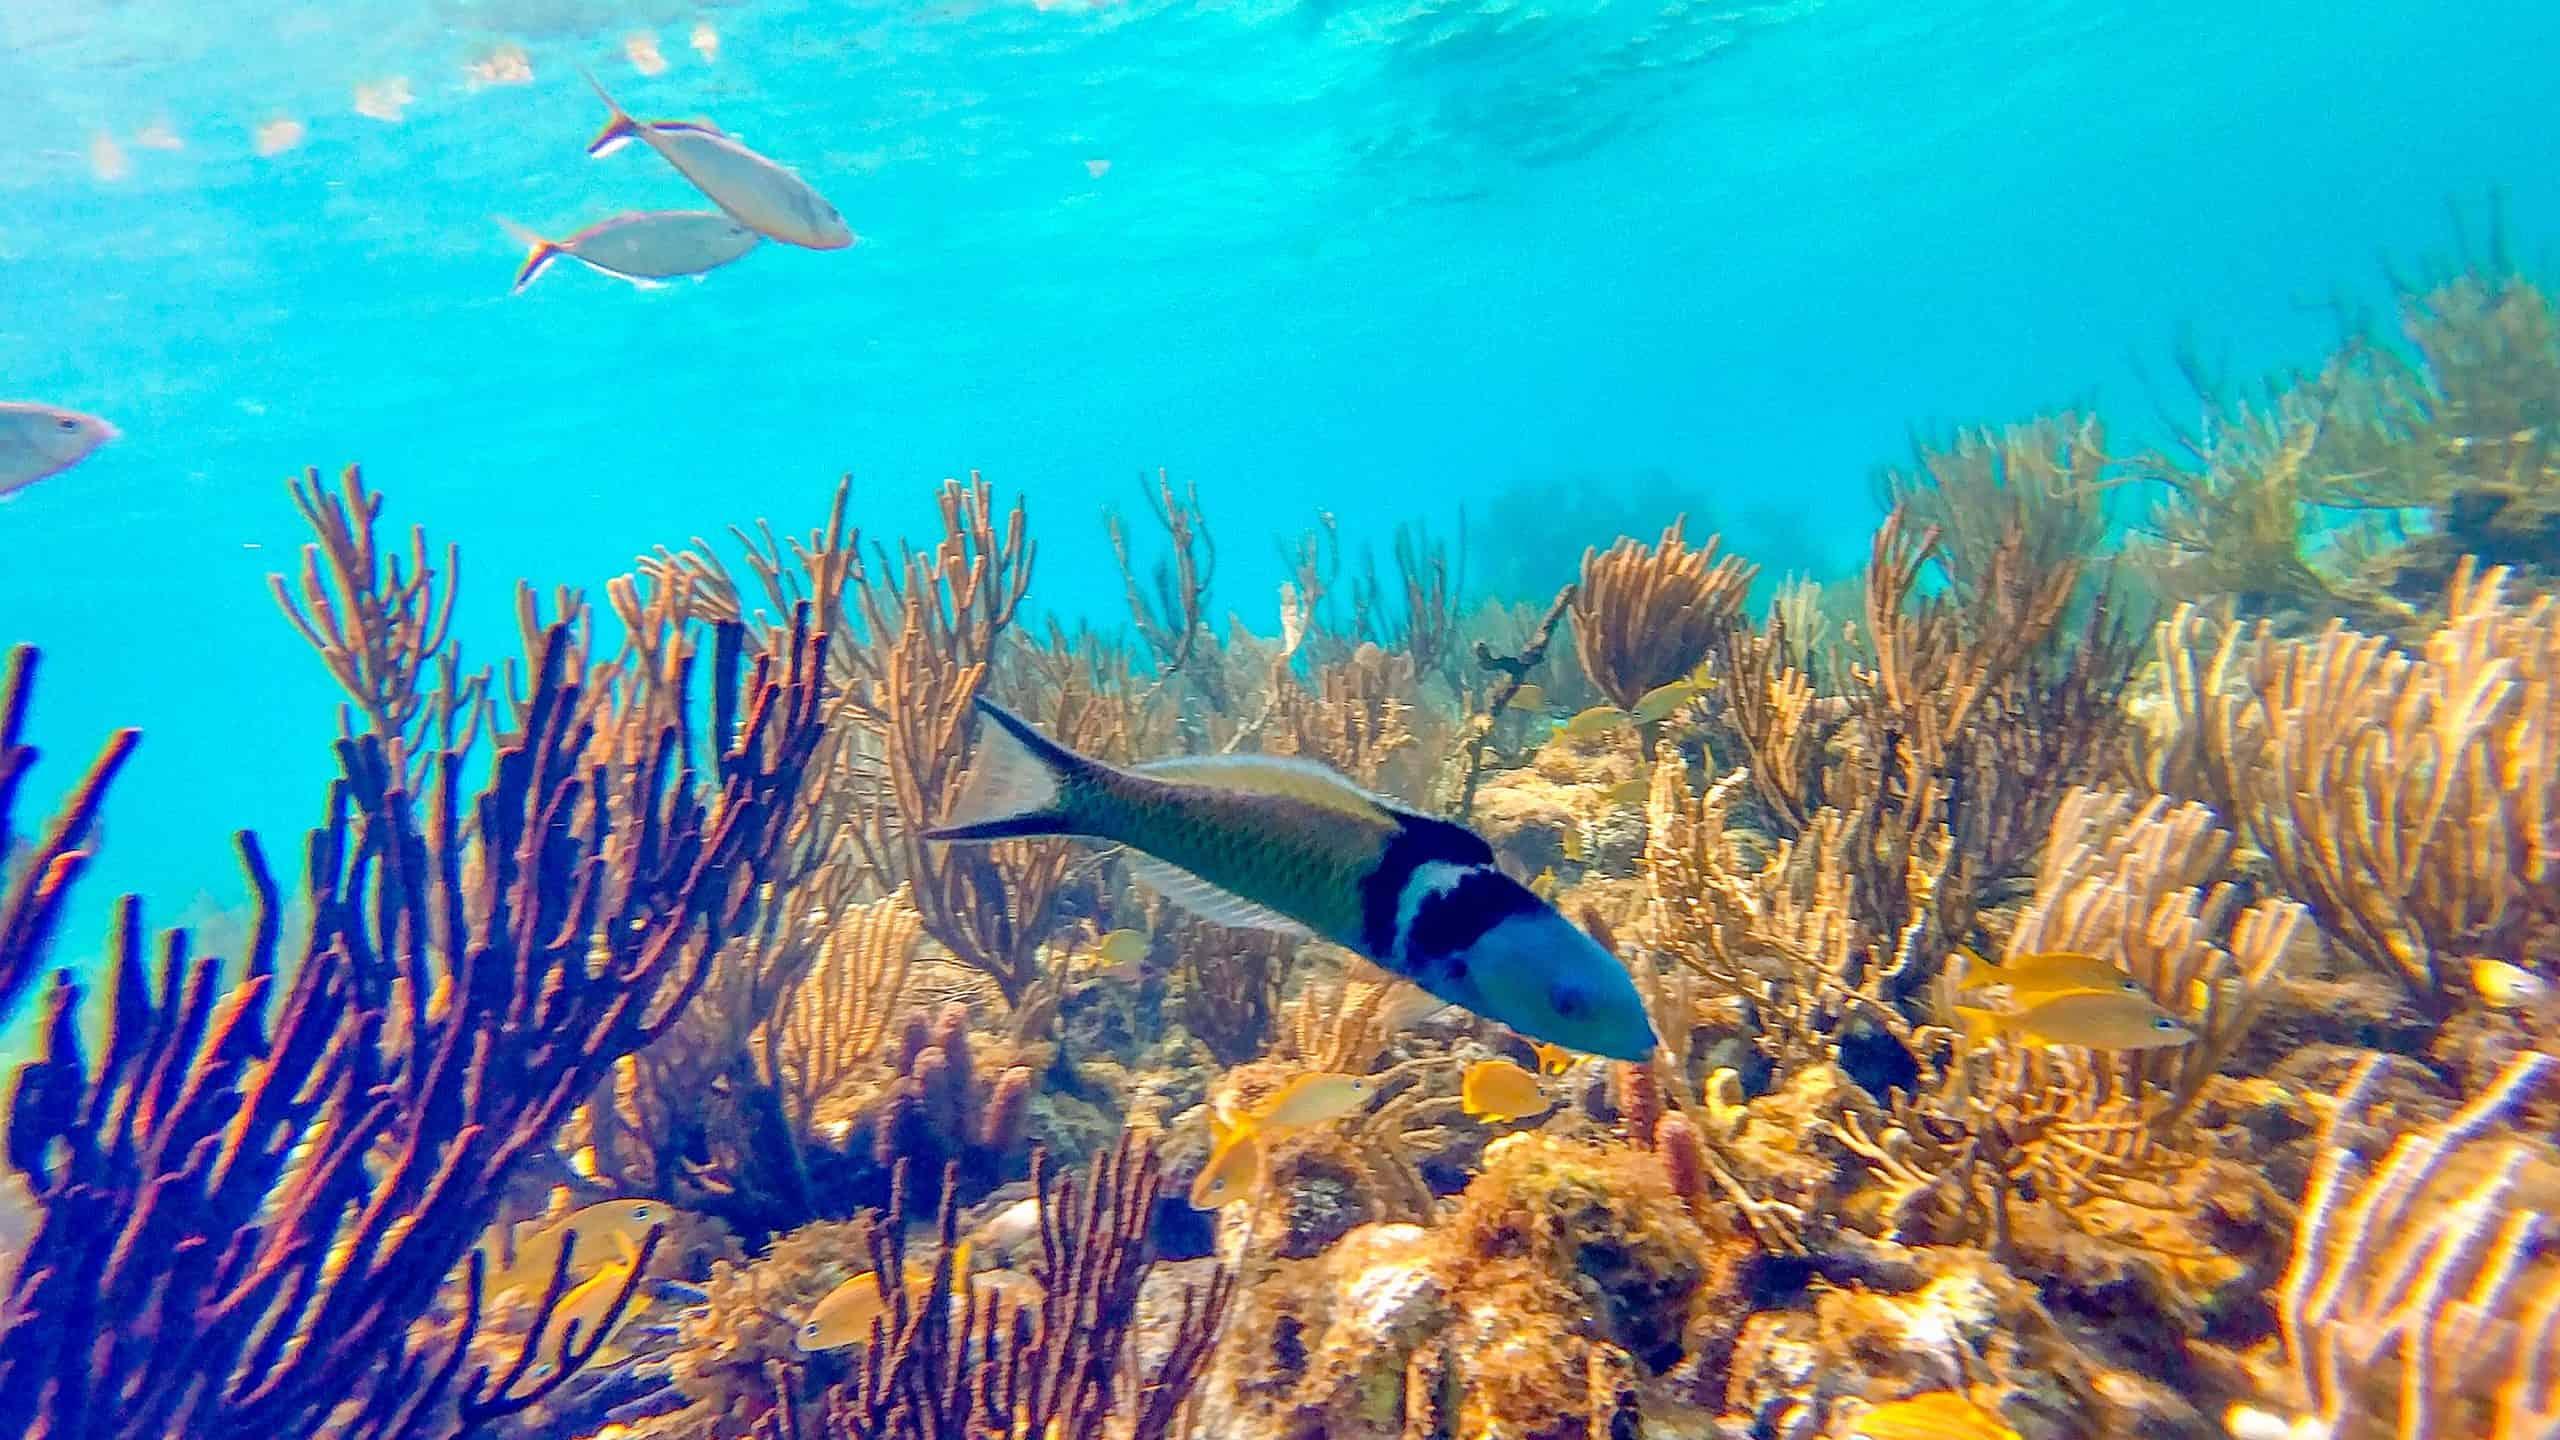 Cayman Islands Destination Guide